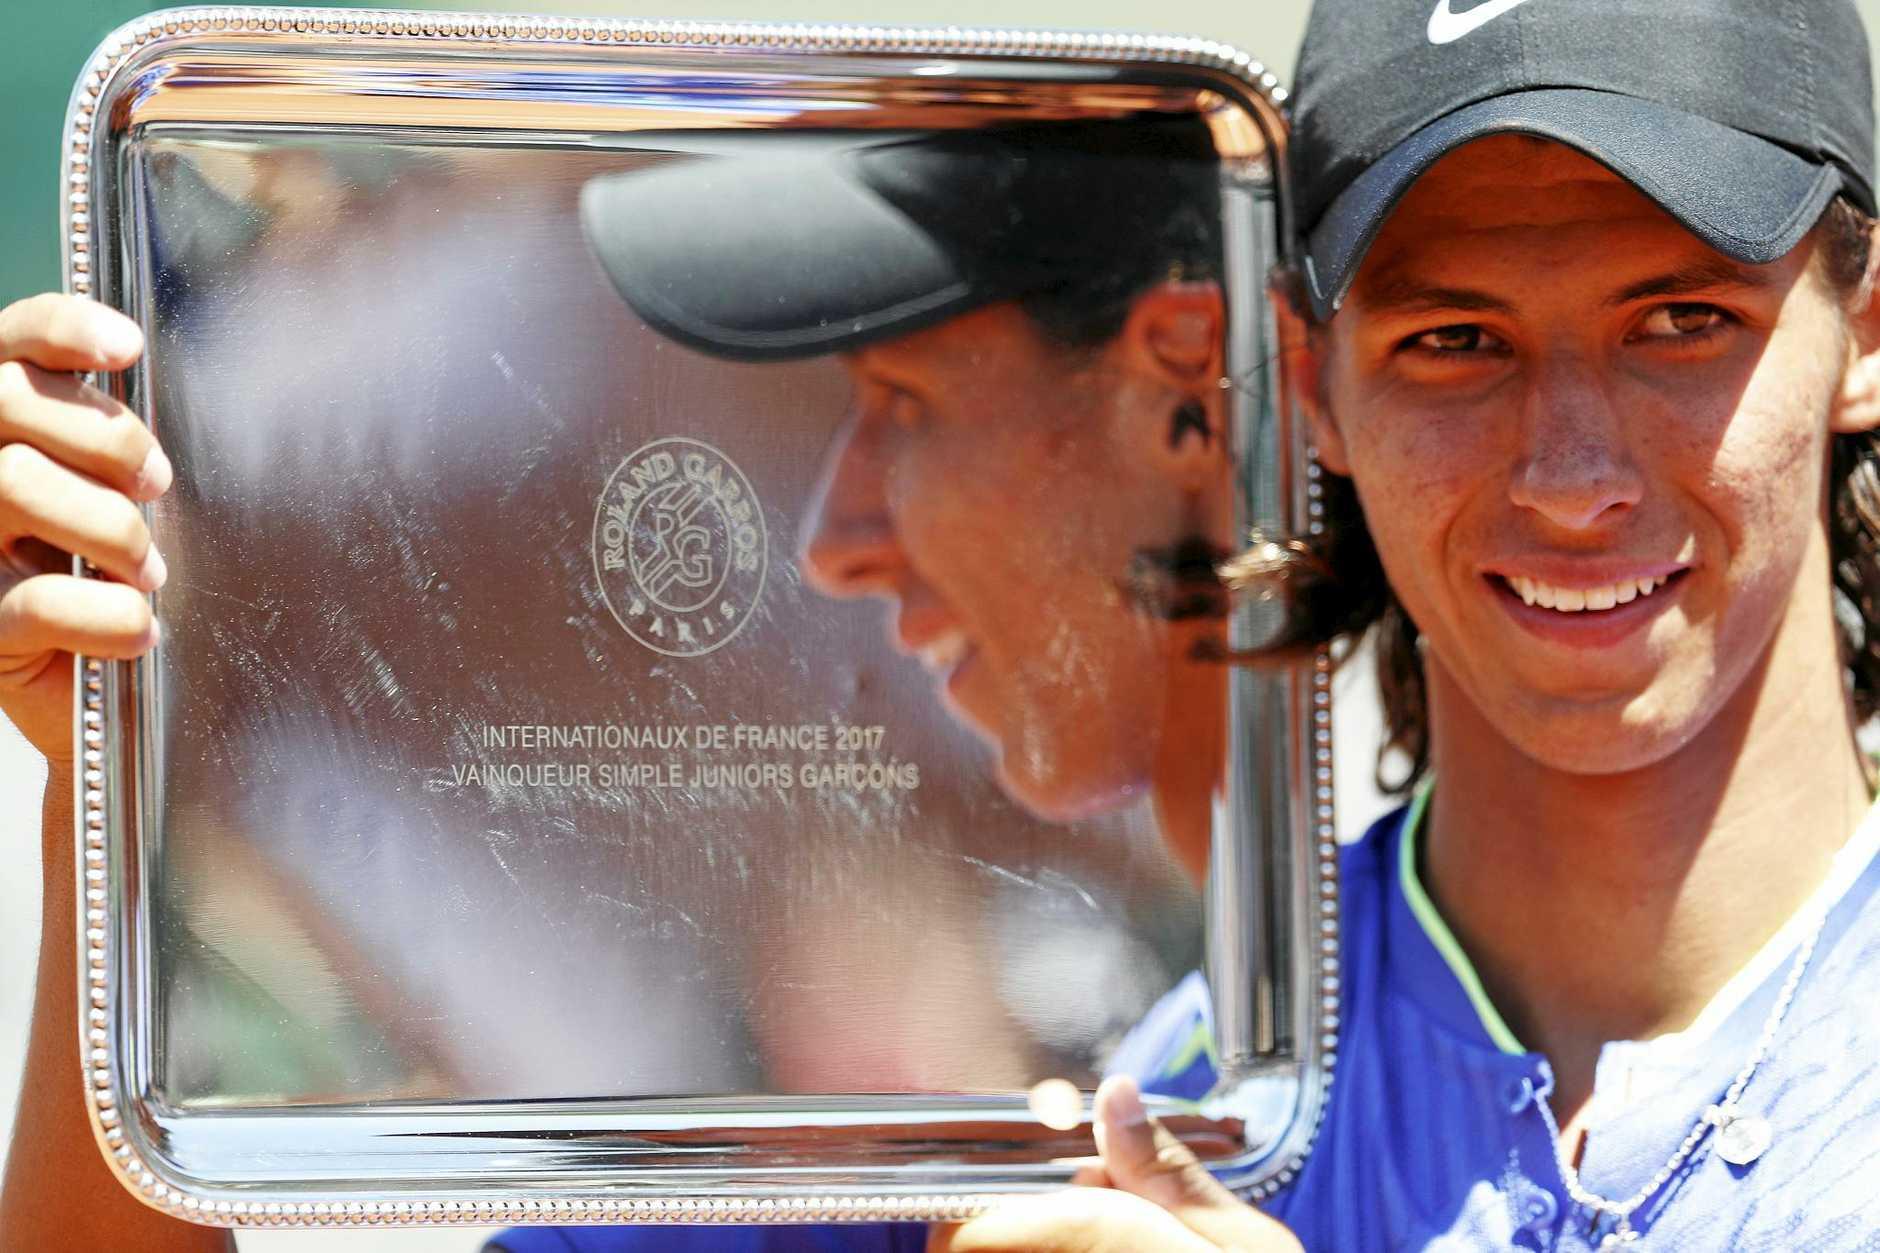 YOUNG CHAMPION: Australia's Alexei Popyrin was all smiles the French Open boy's title.